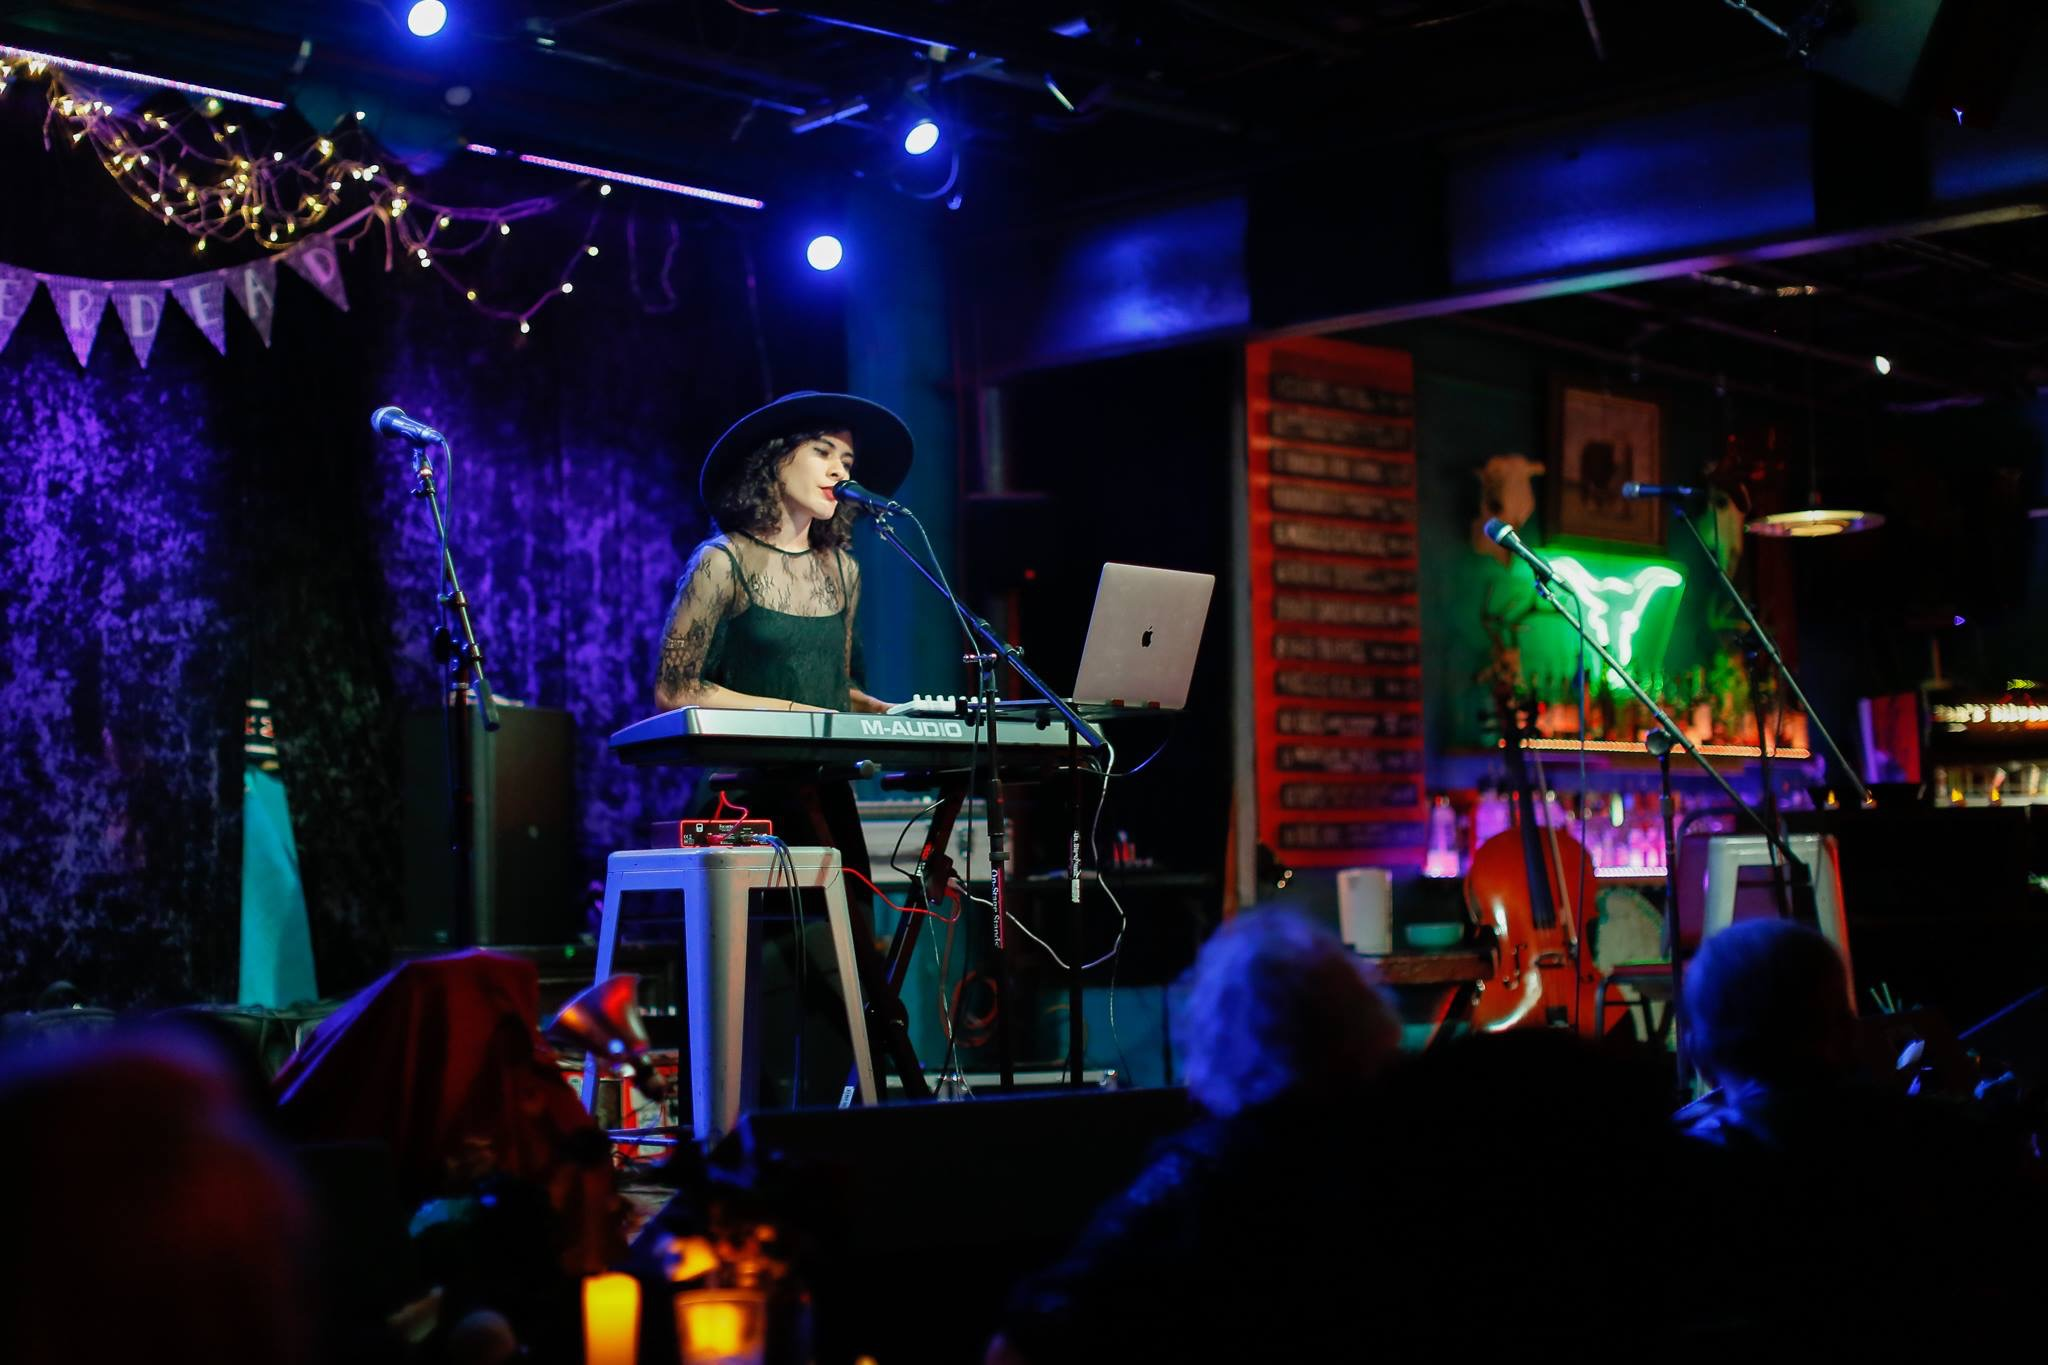 Isabel Crespo performing at Spiderdead | photo by Nina Chantanapumma